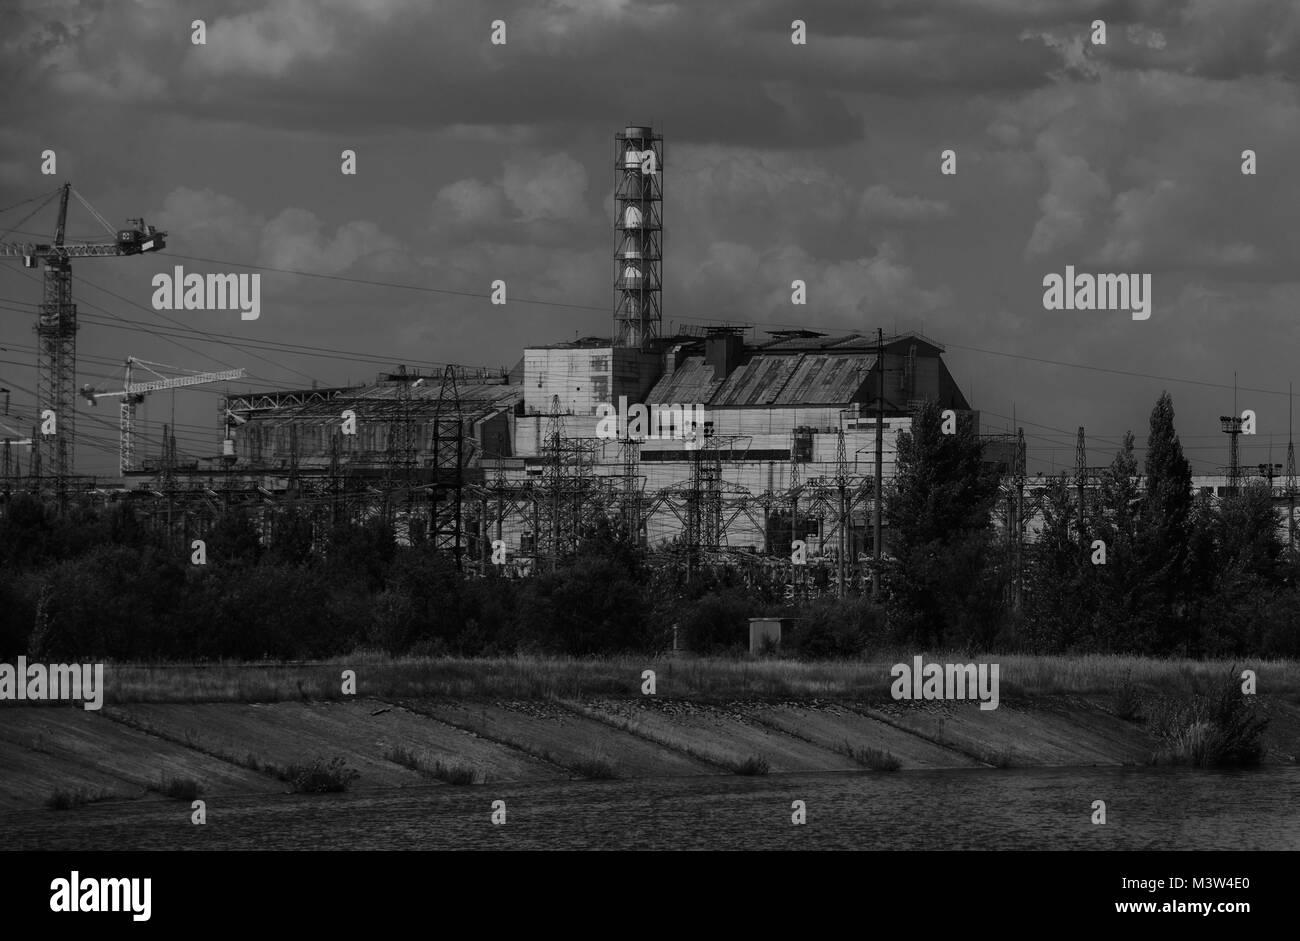 Chernobyl Pripyat taken in 2015 - Stock Image